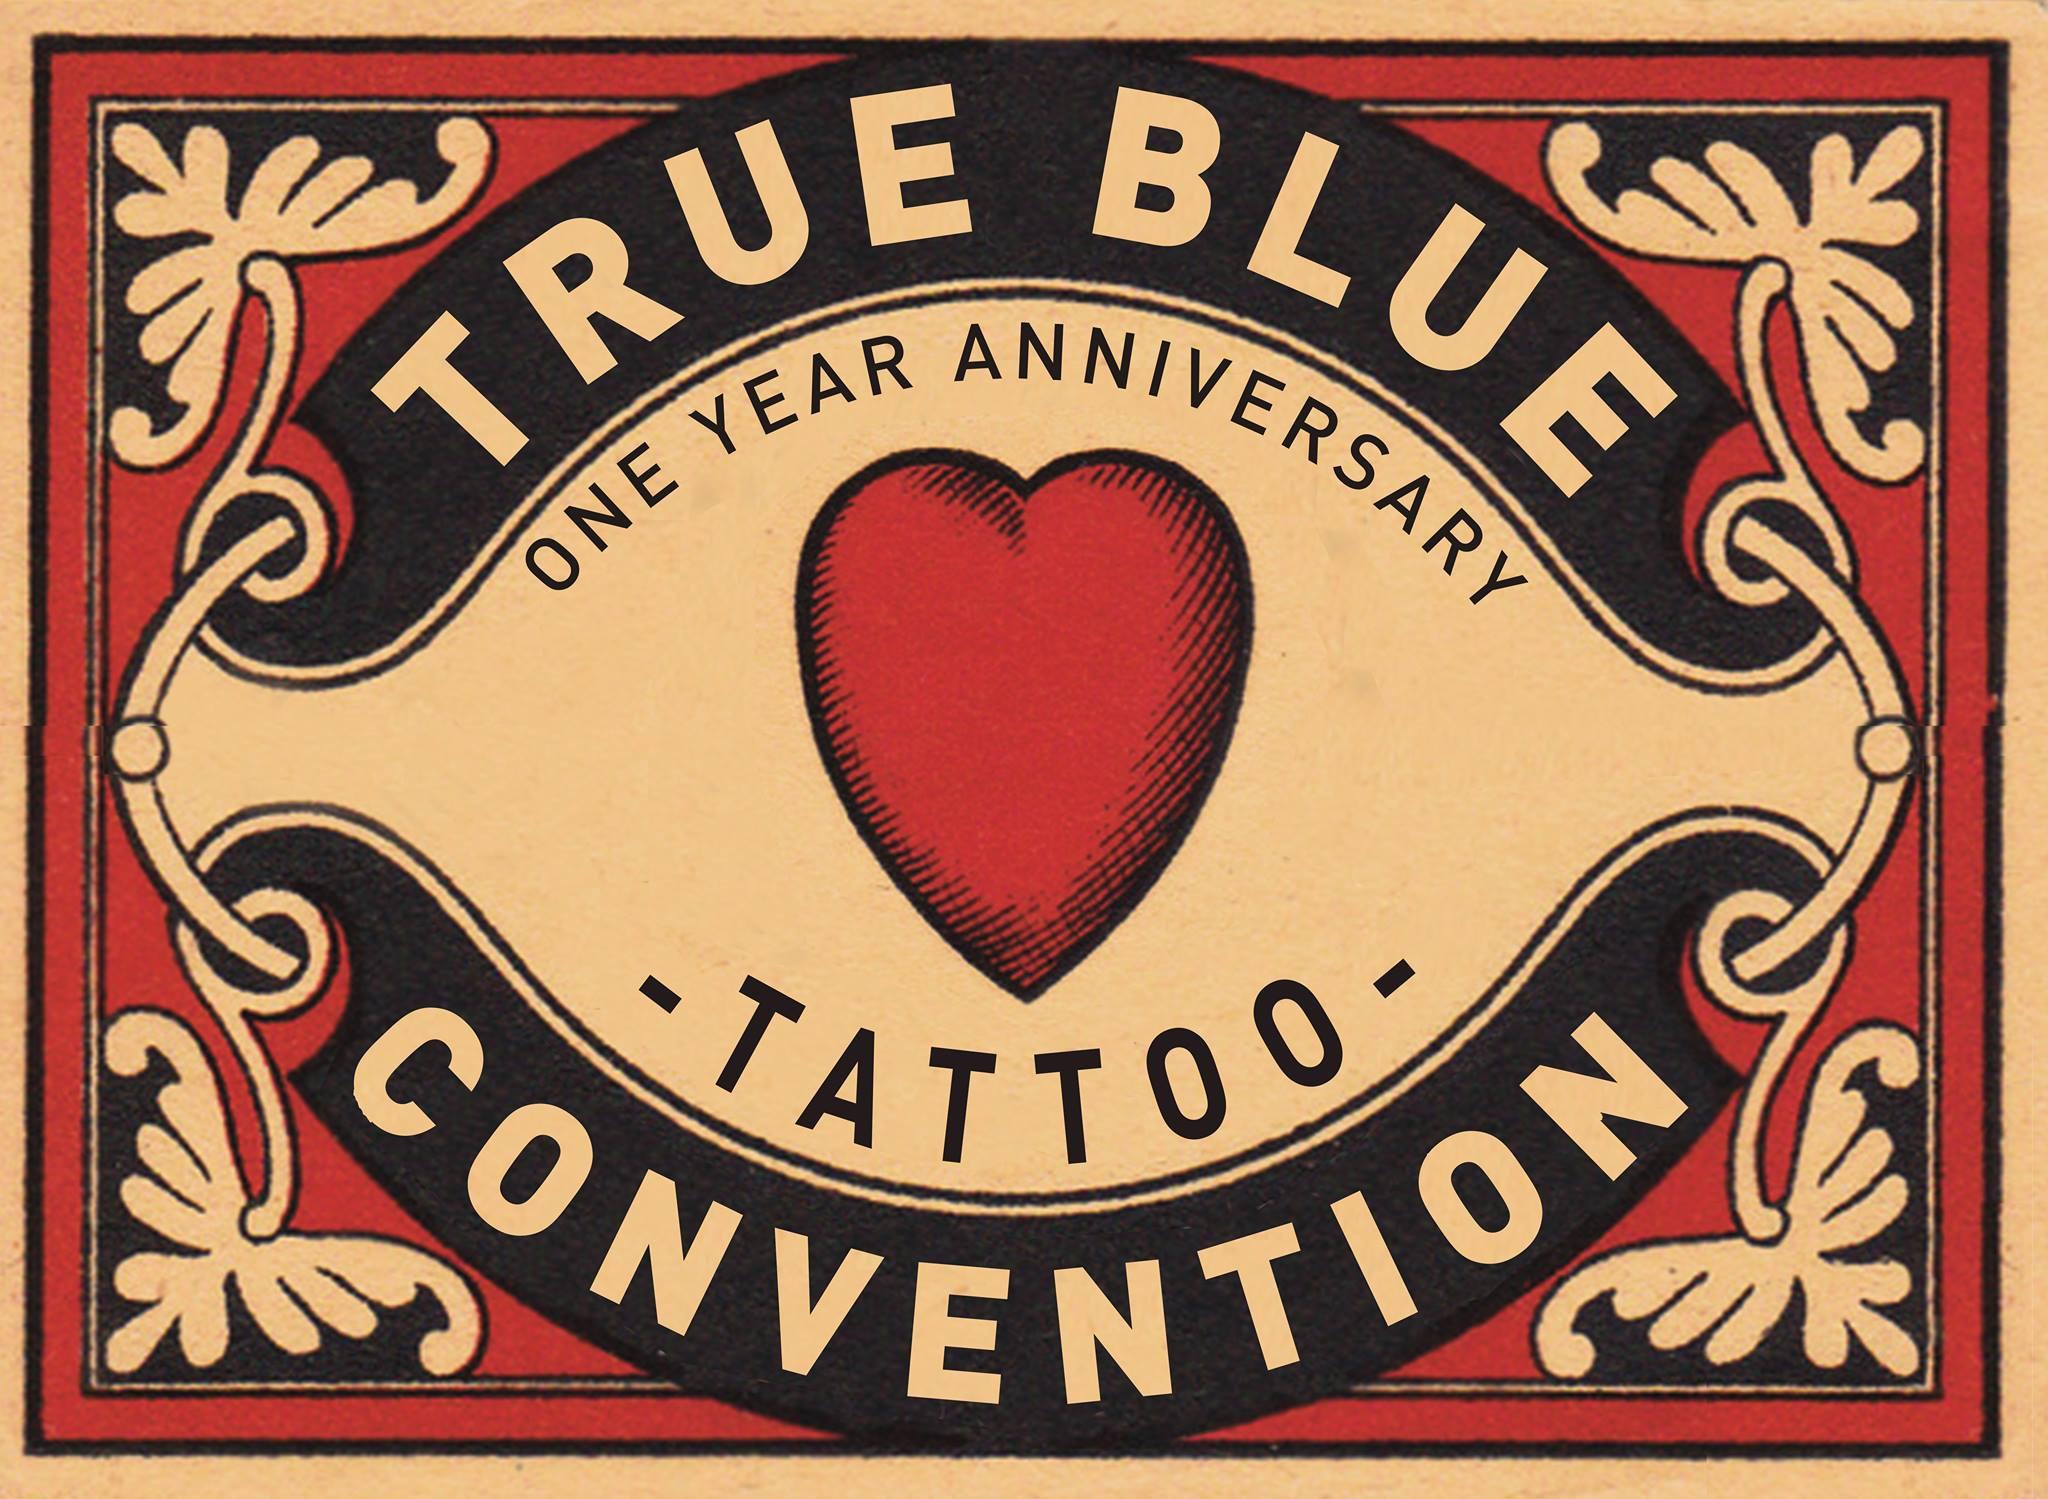 true blue anniversary banner.jpg